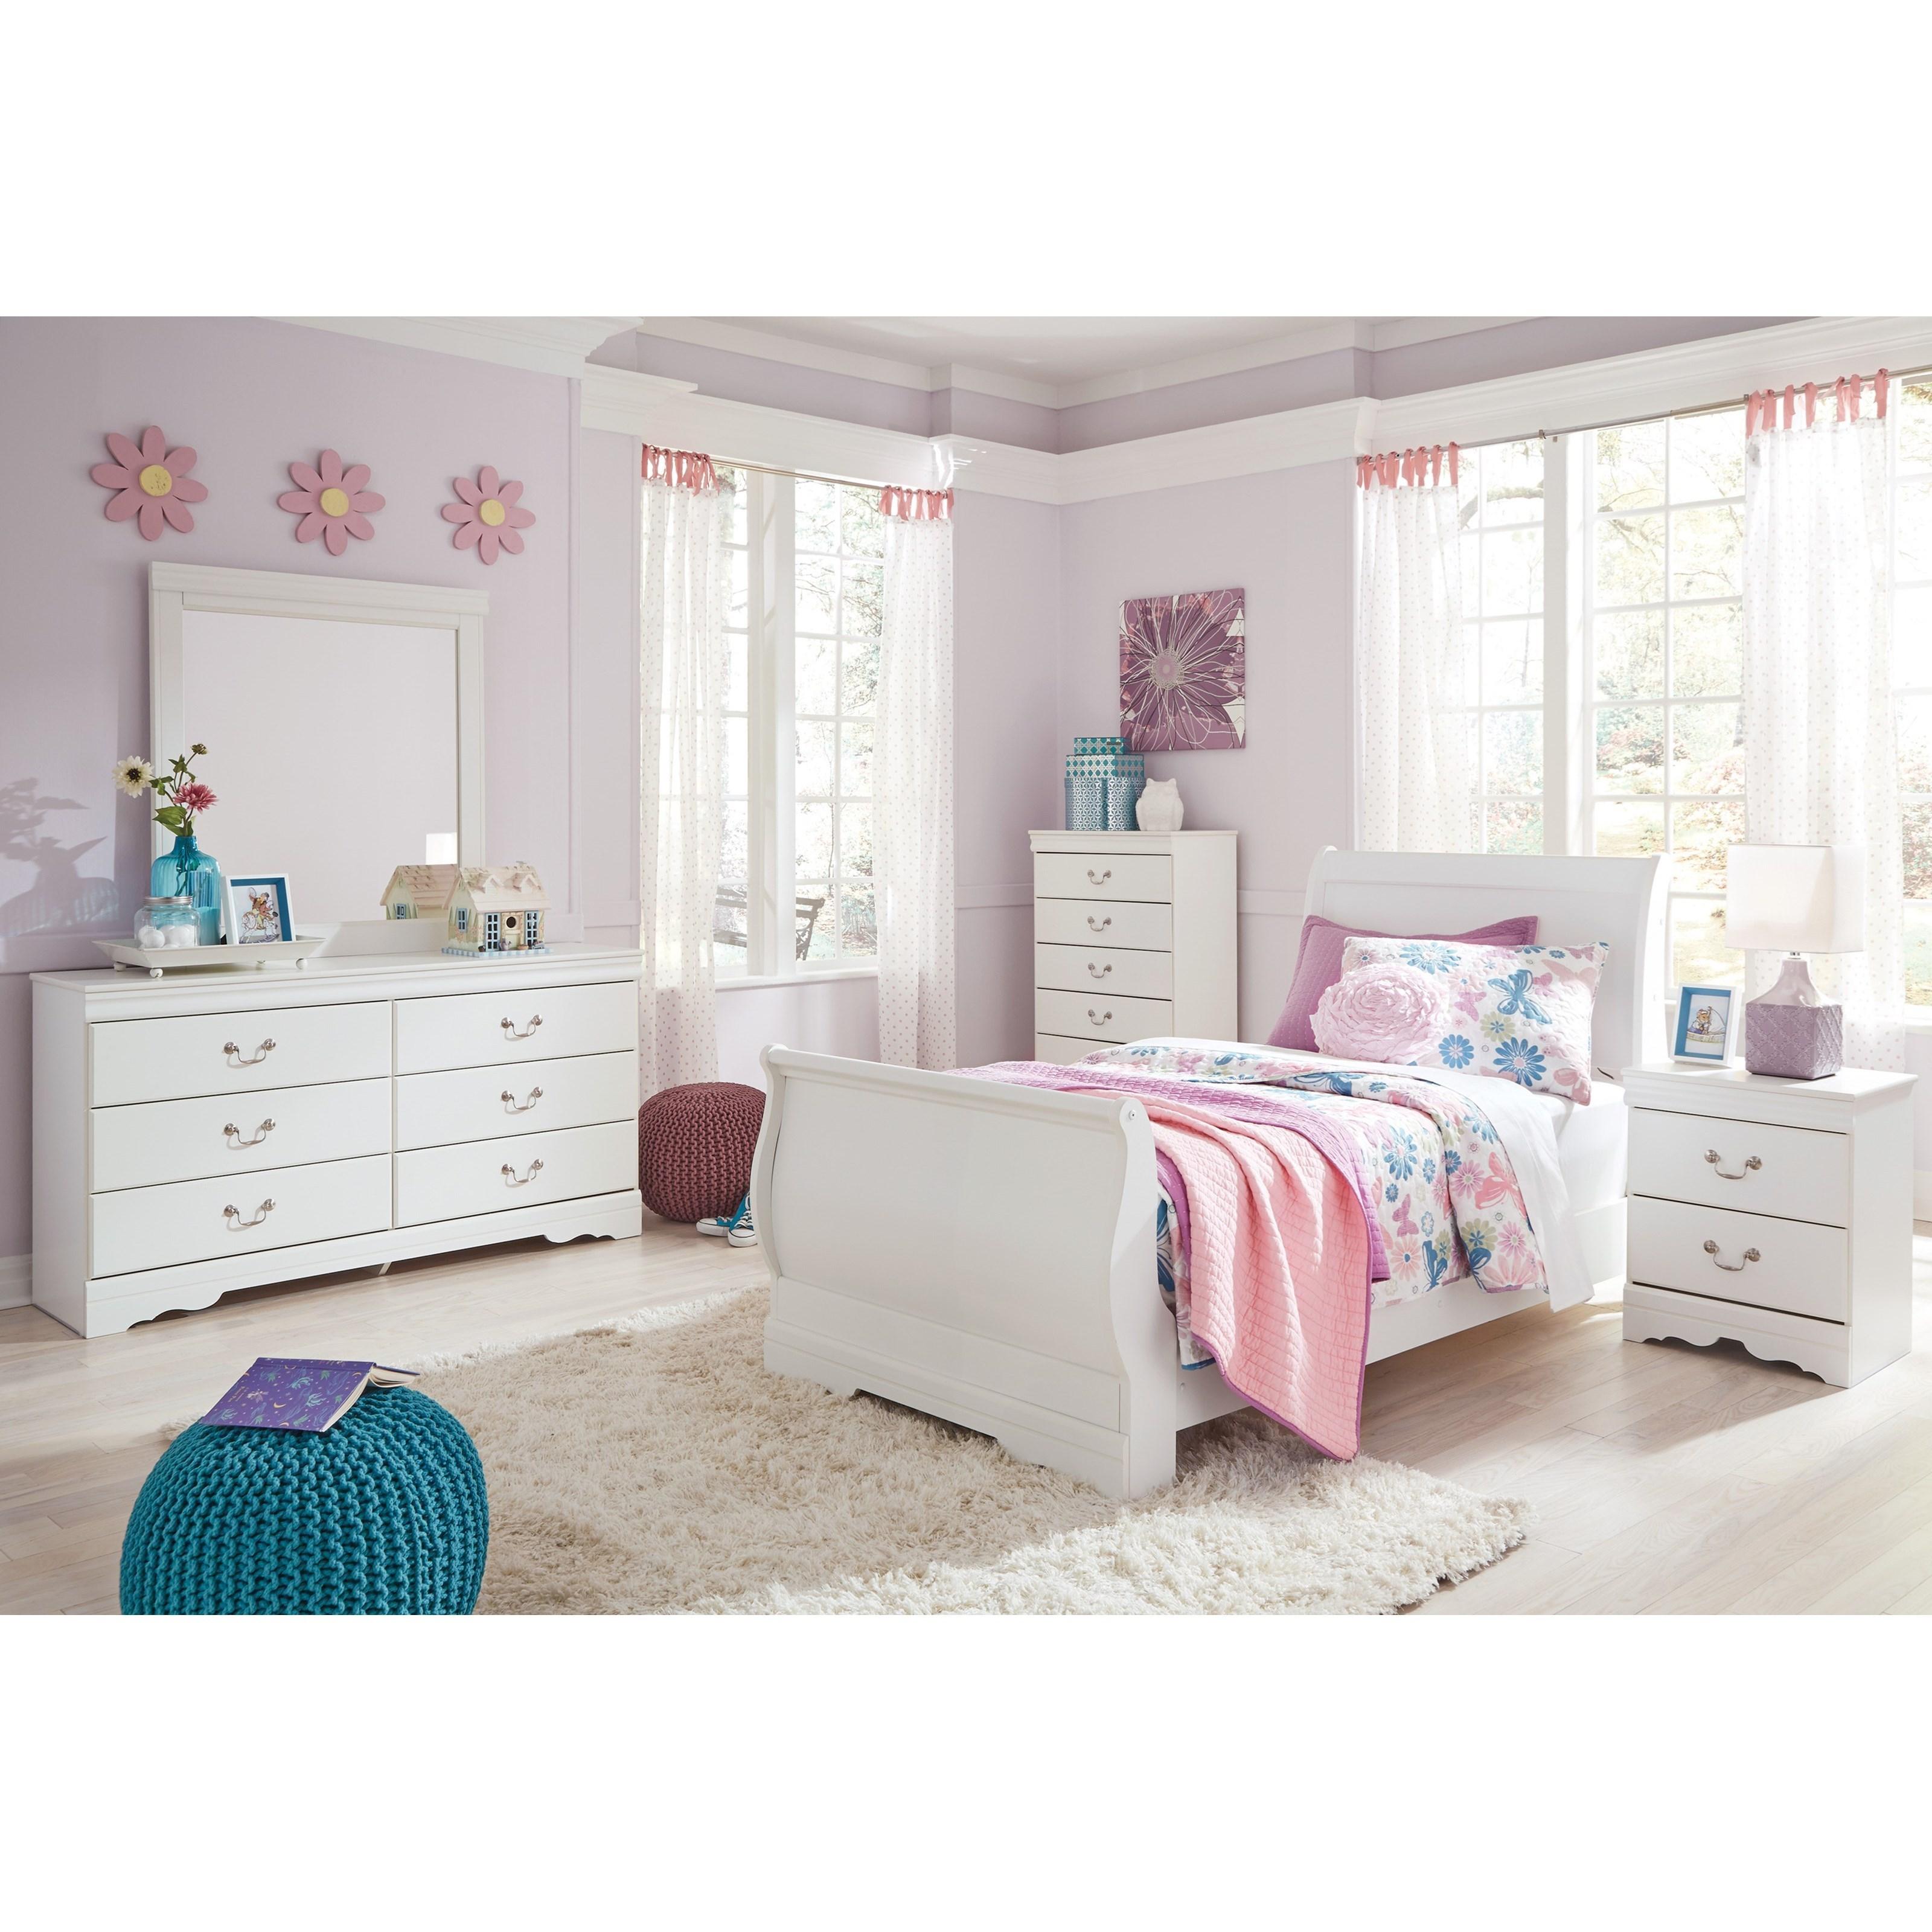 Anarasia 4-Piece Bedroom Group by Ashley (Signature Design) at Johnny Janosik